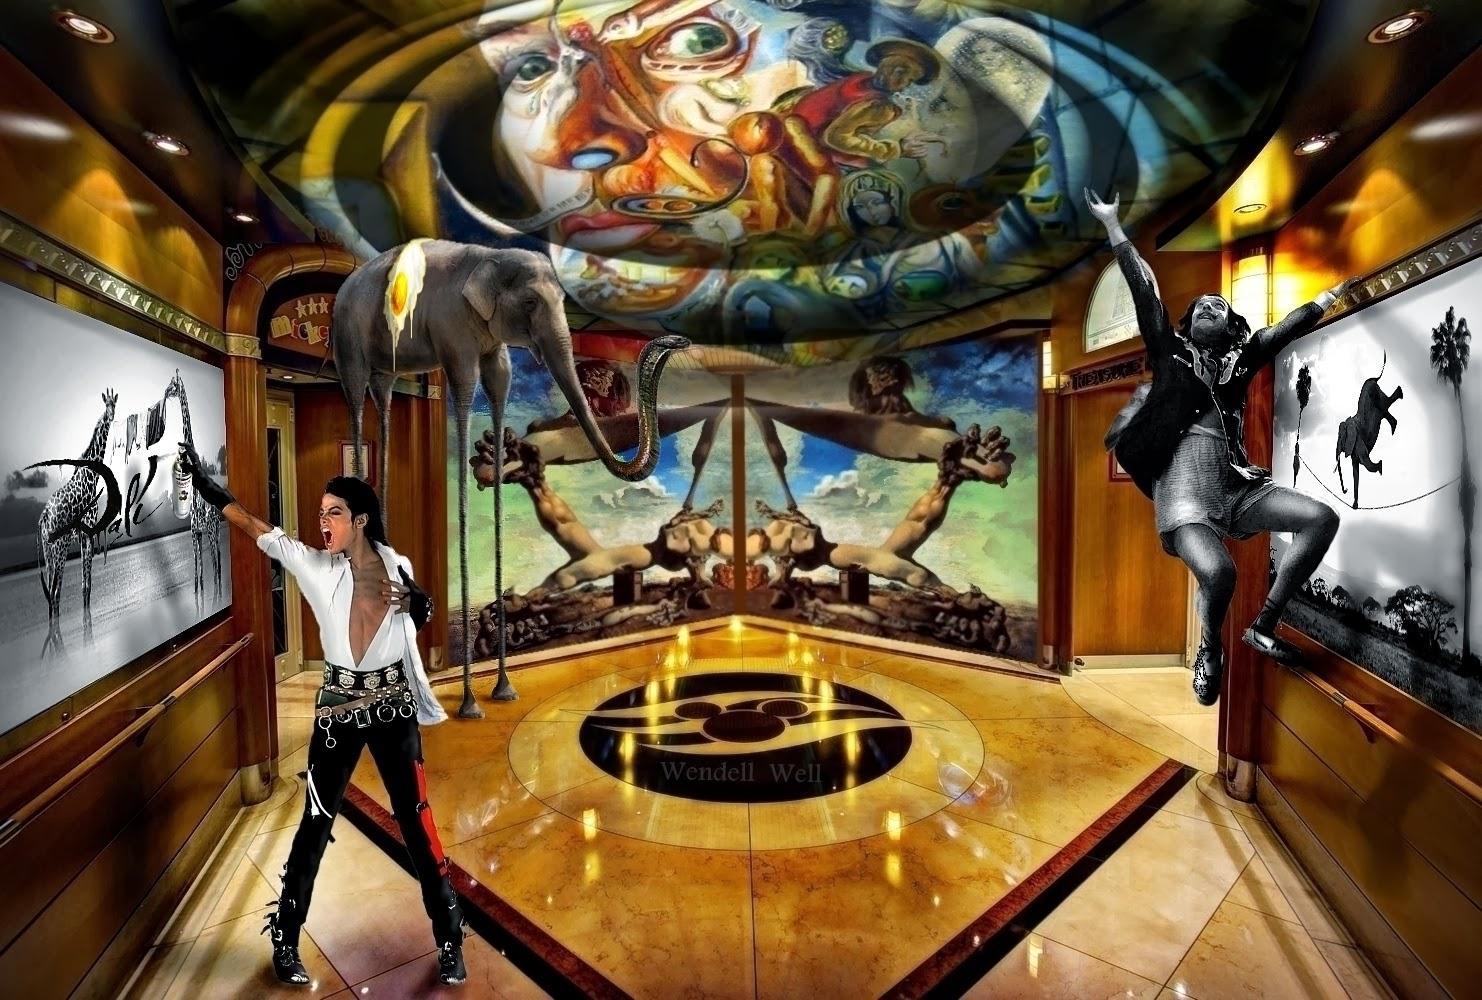 a biography of salvador dali a surrealist painter